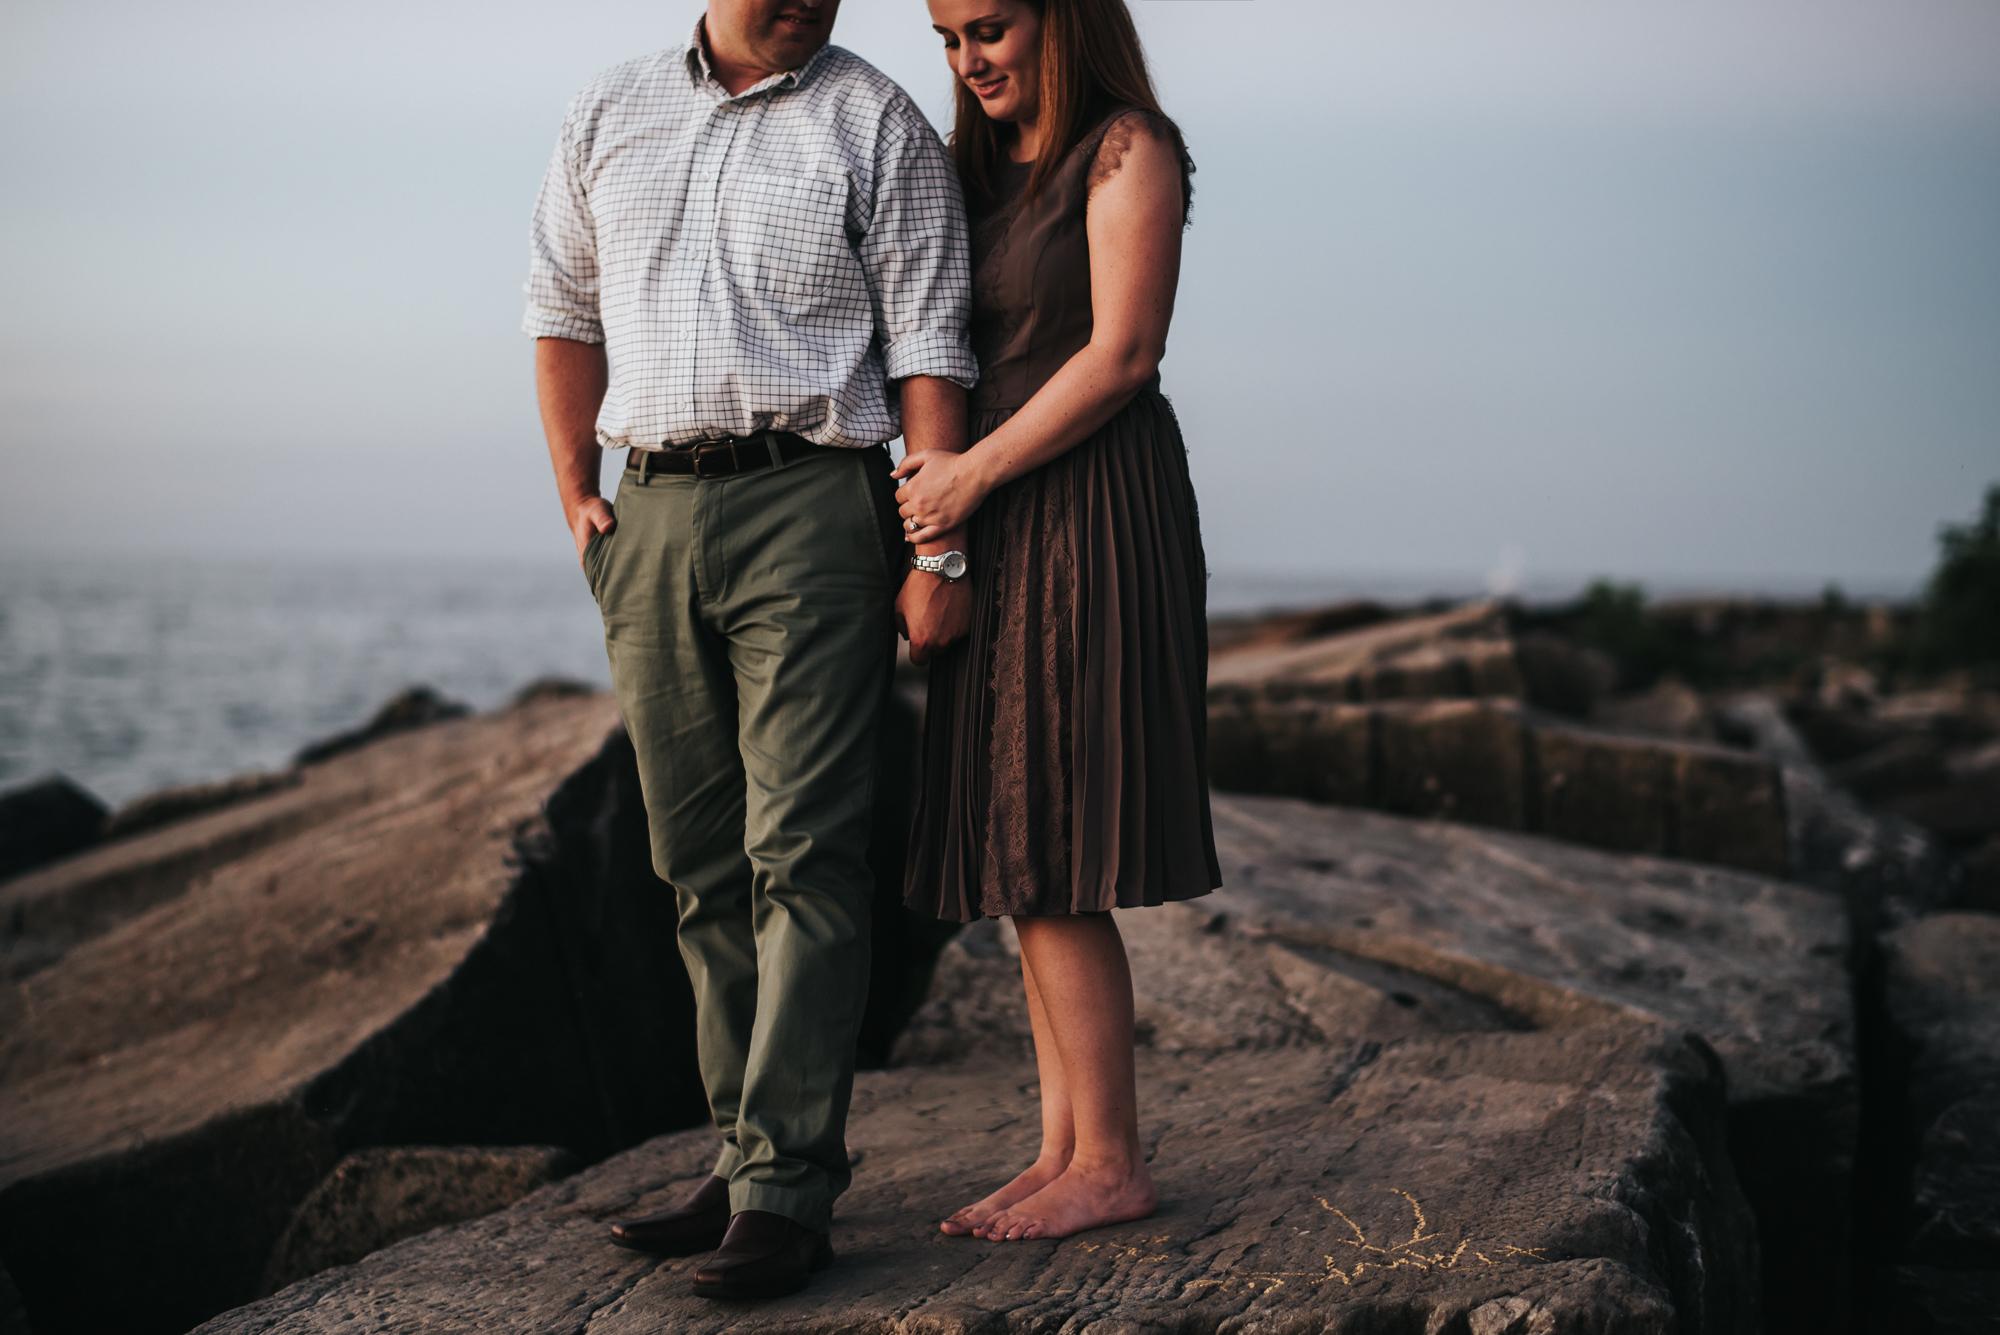 edgewater beach engagement session - cleveland ohio